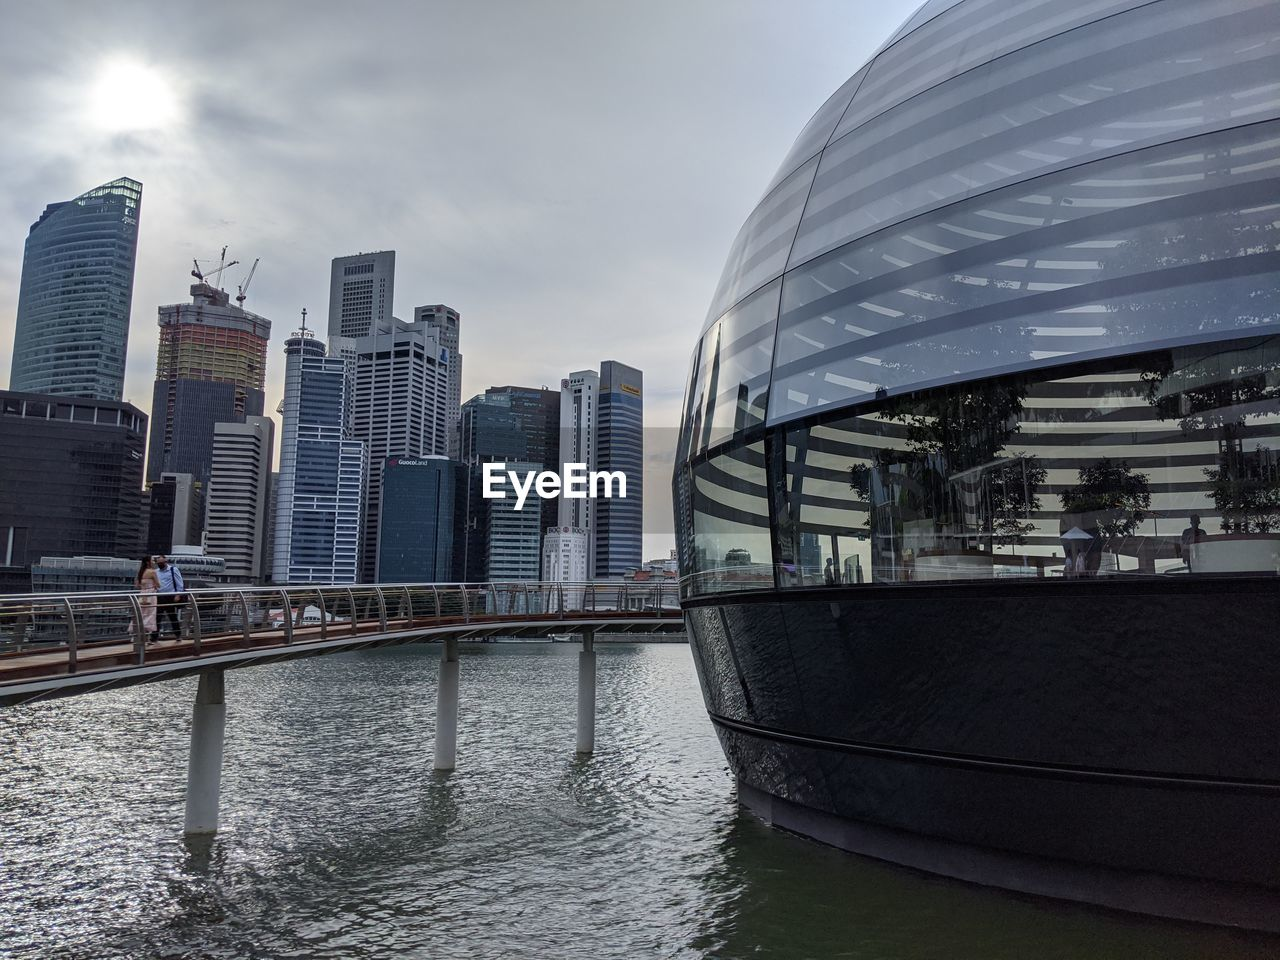 RIVER BY MODERN BUILDINGS IN CITY AGAINST SKY